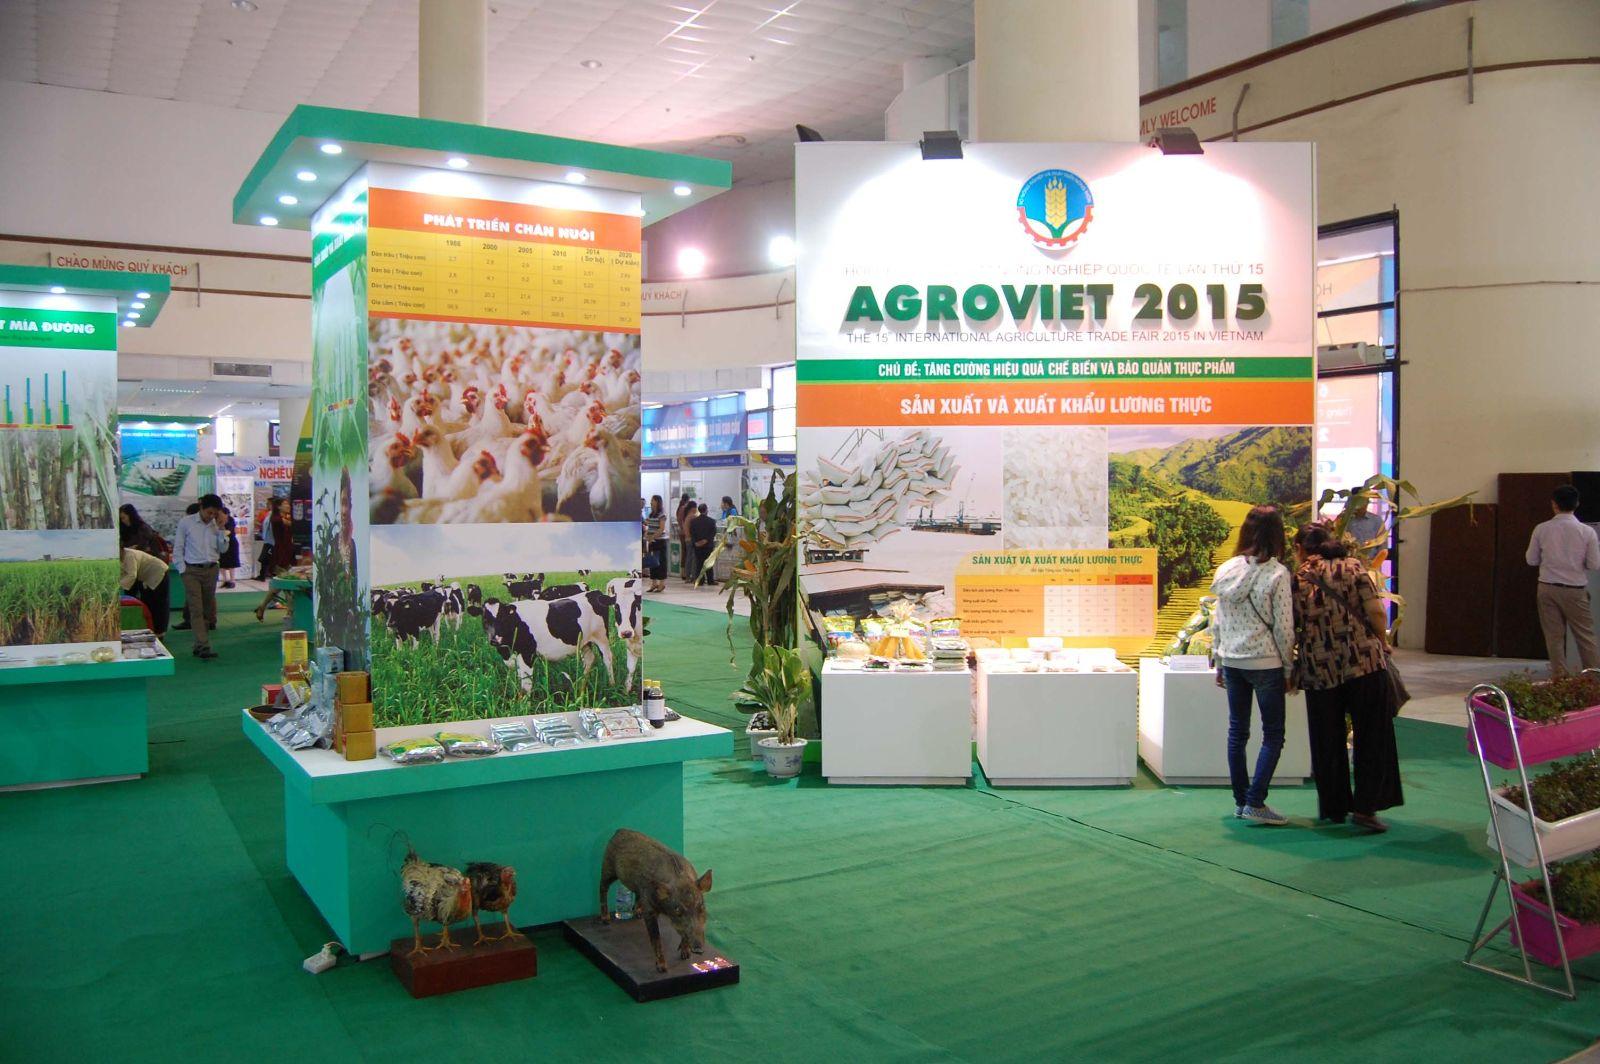 TRIỂN LÃM QUỐC TẾ AGROVIET 2015